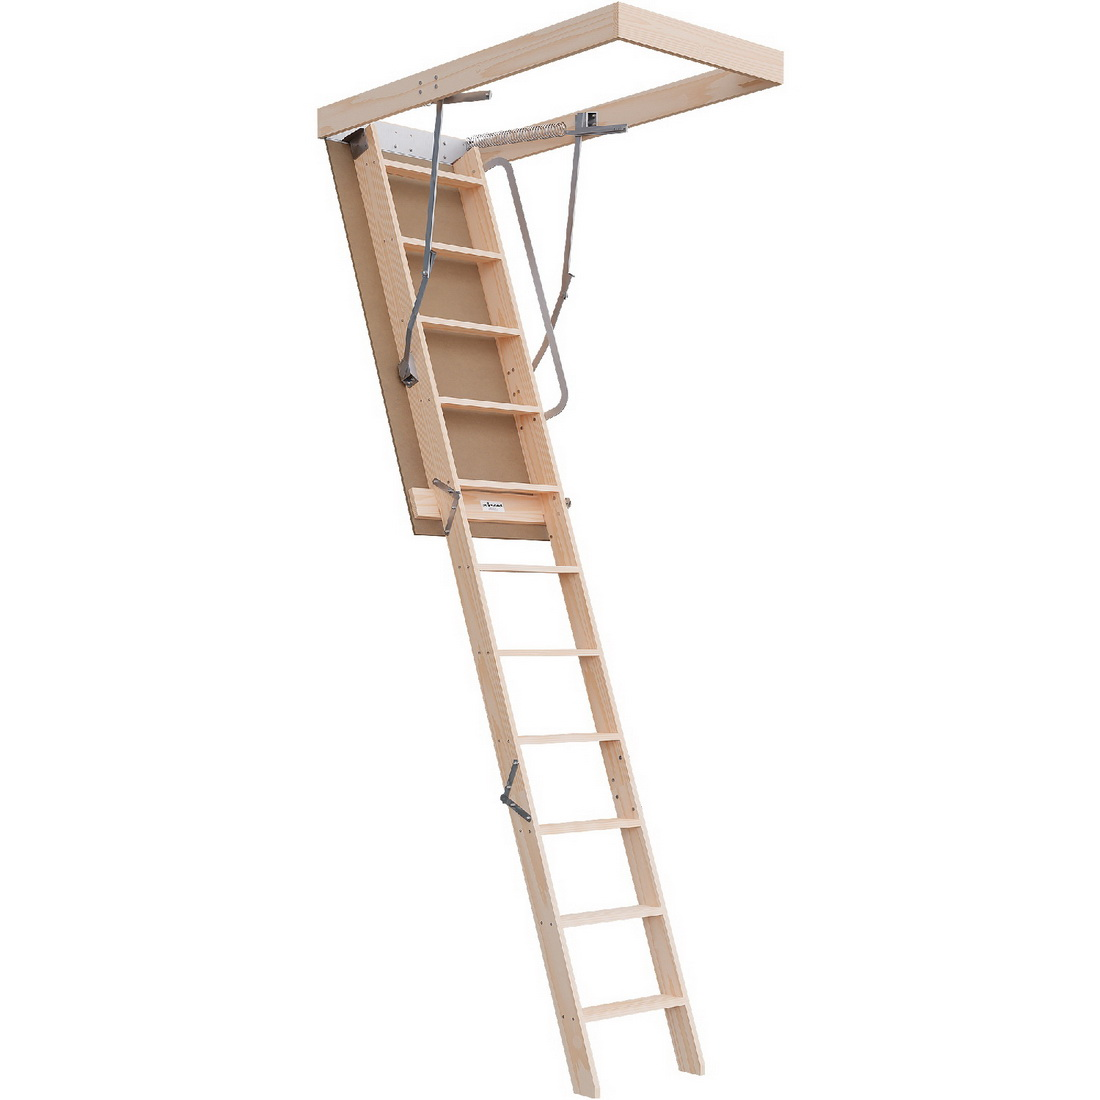 Regular Range 2750-3100mm Attic Ladder Timber